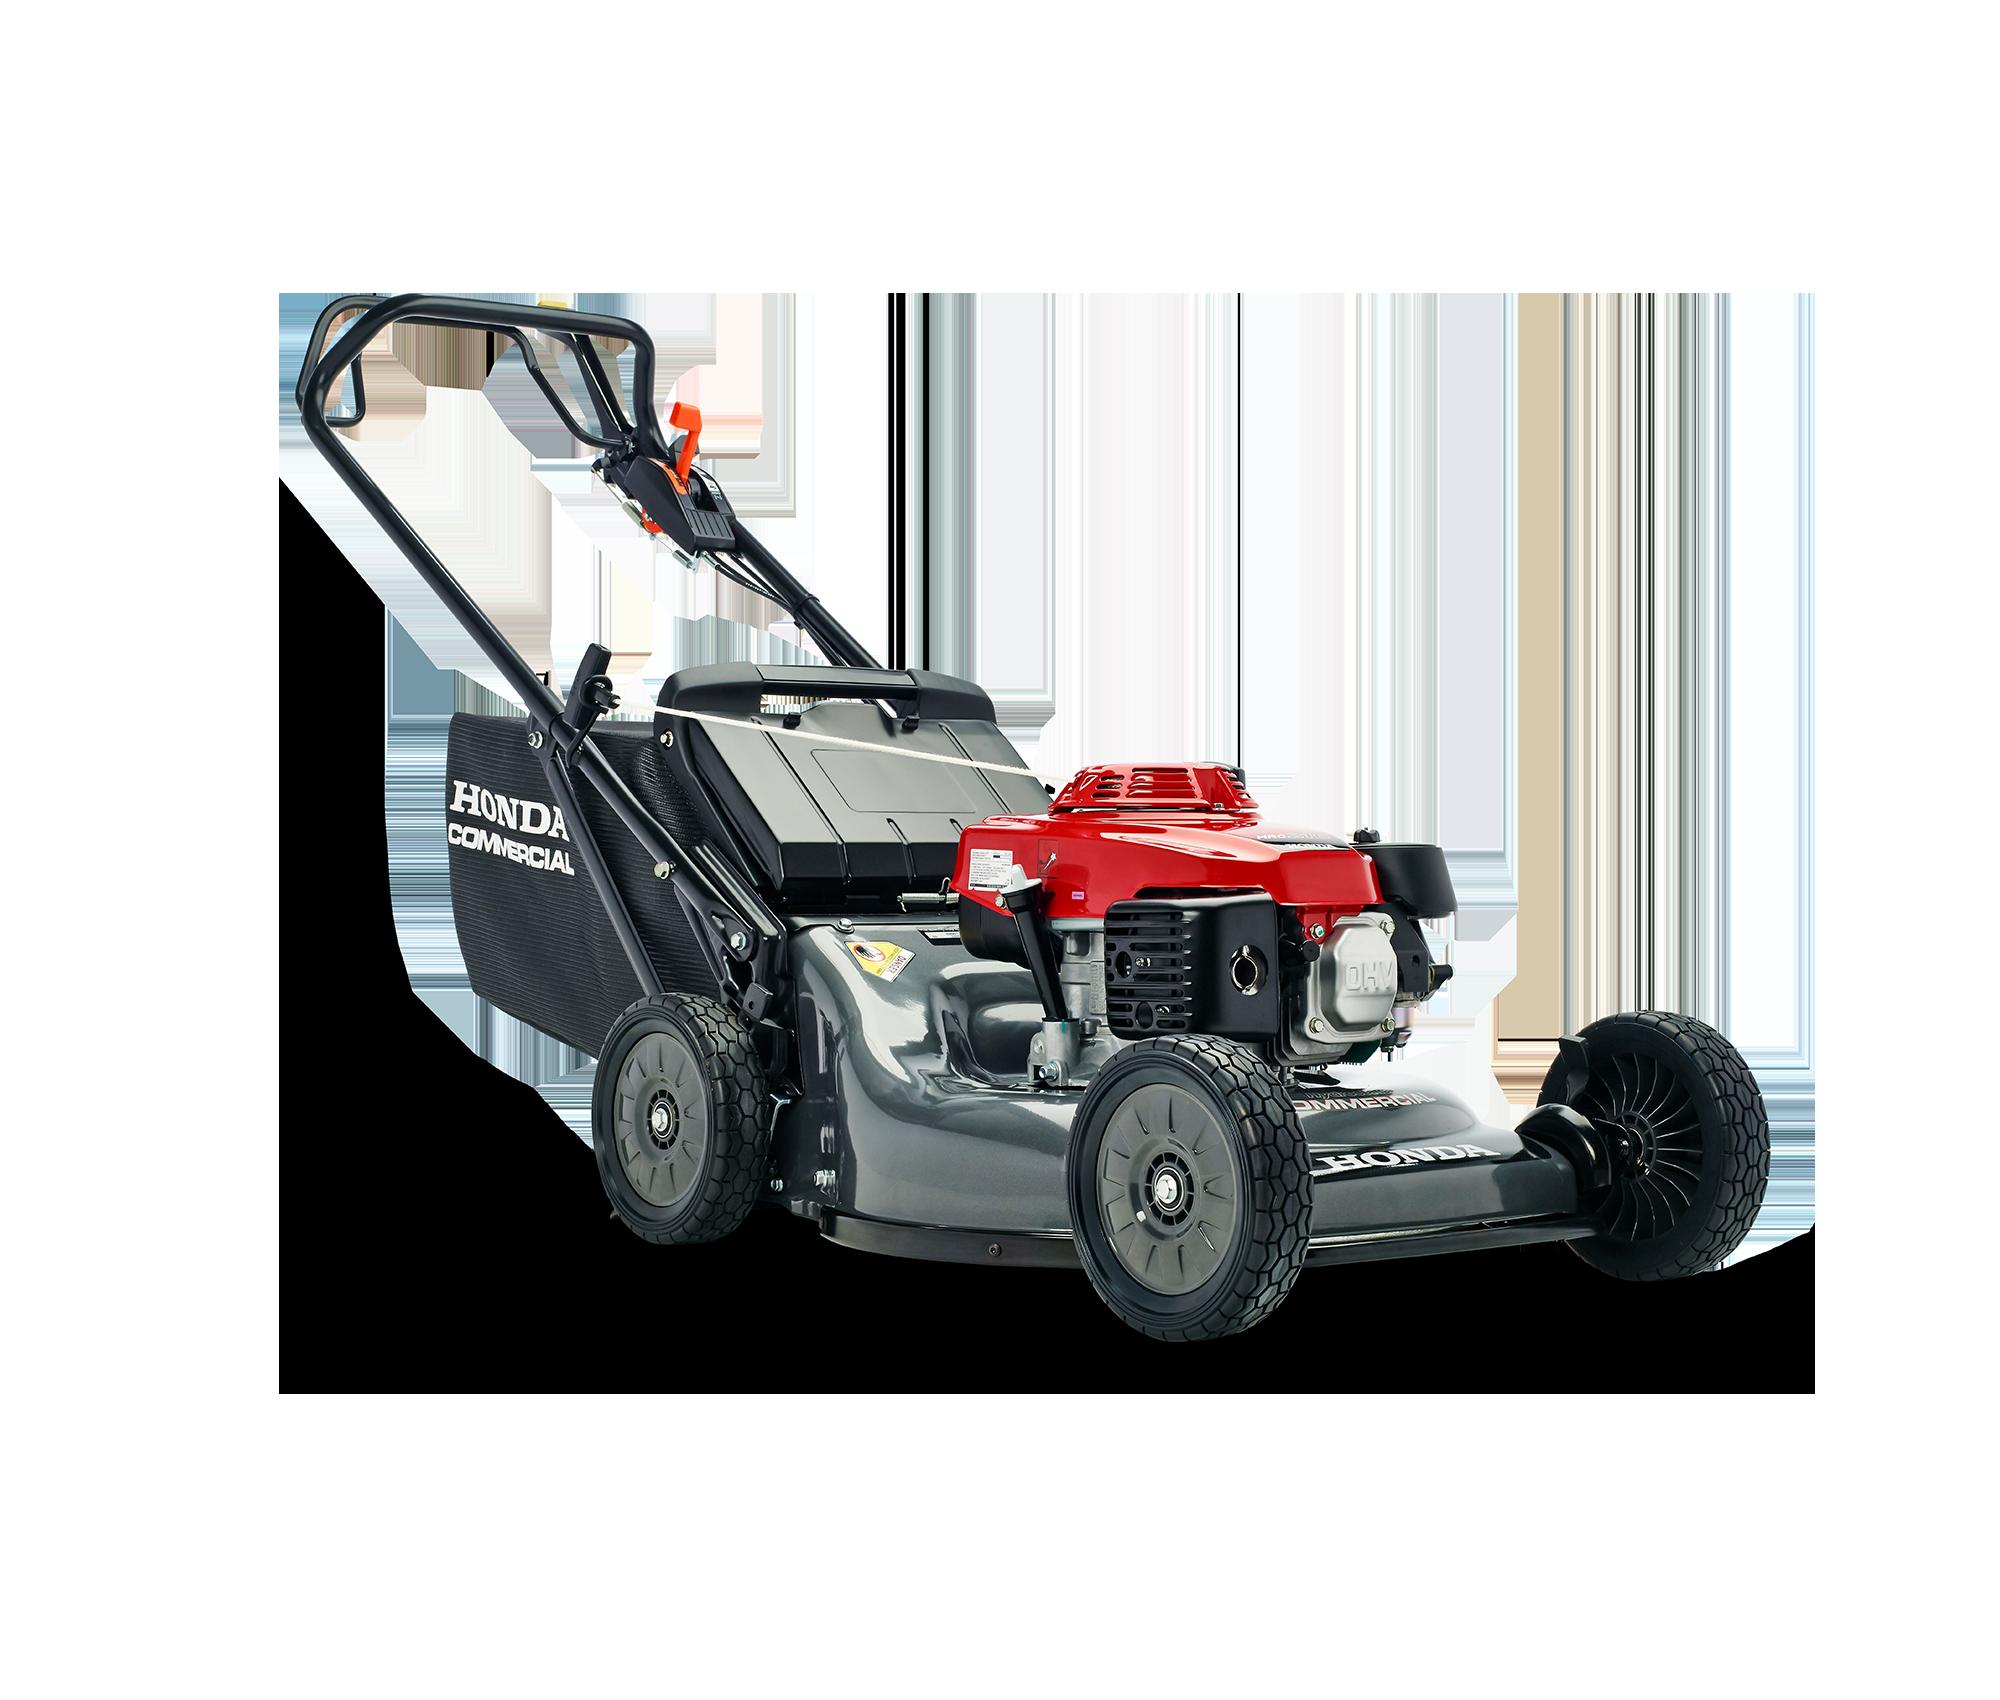 Hrc Hydrostatic Pro Honda Lawn Mower Fuel Filter